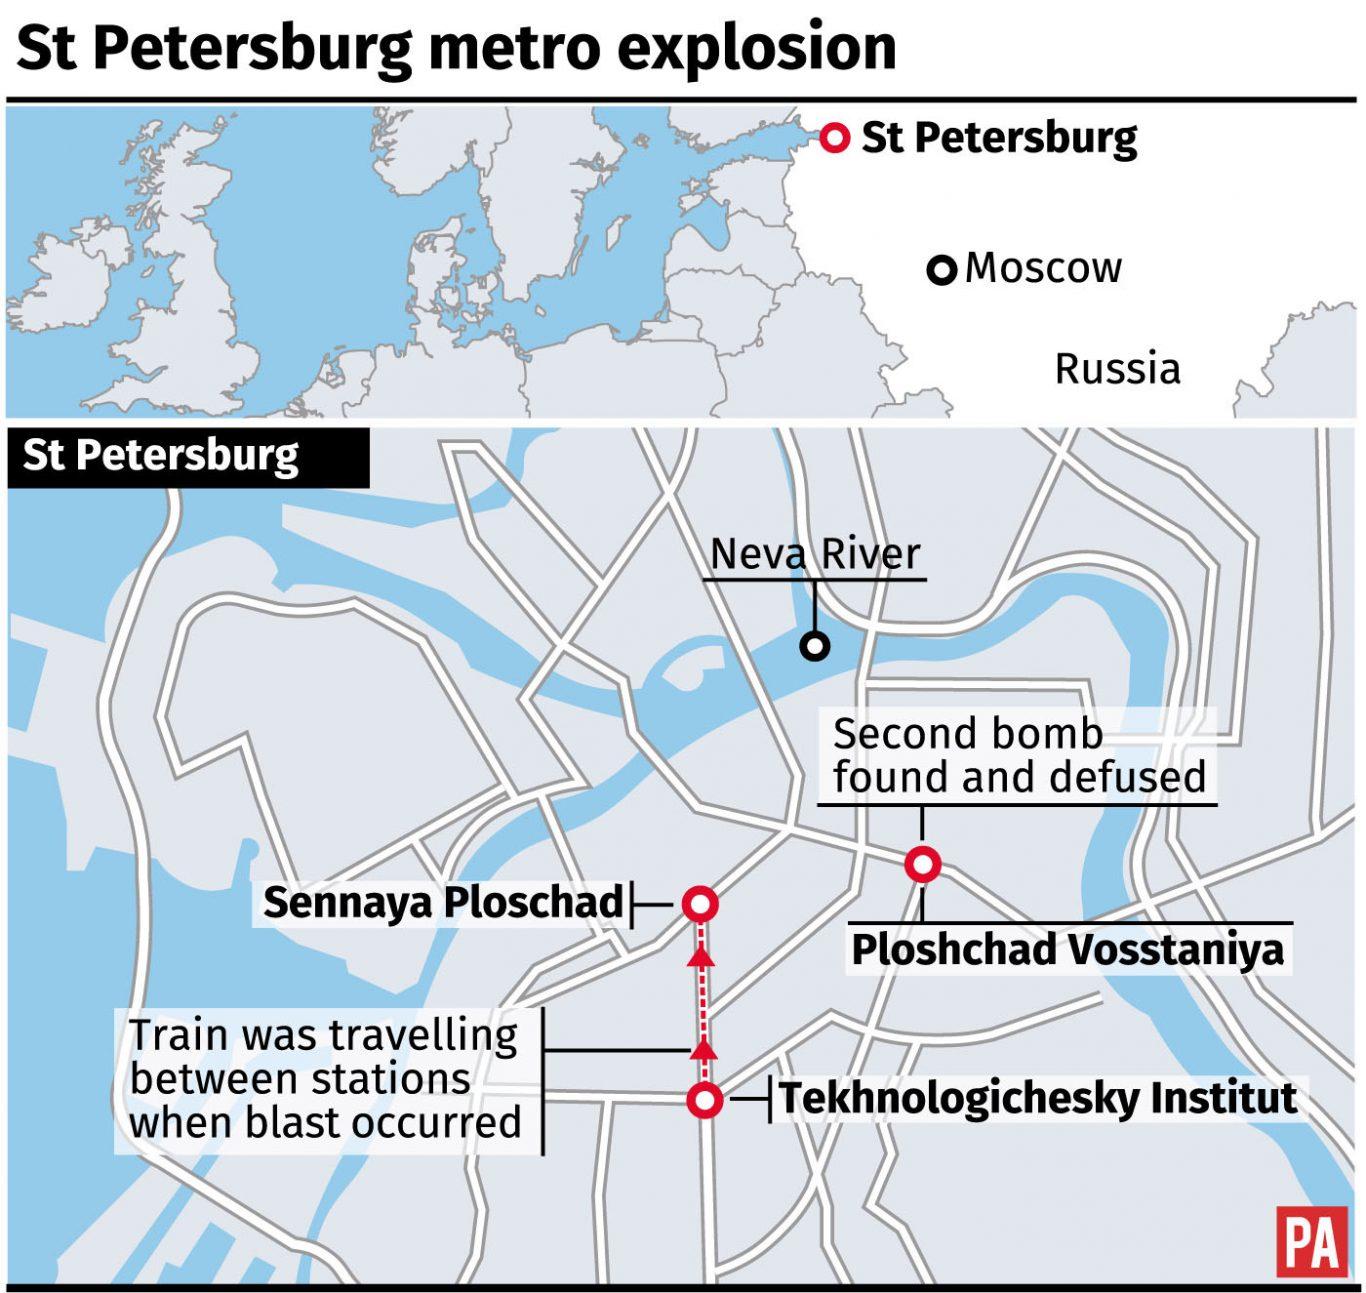 Saint Petersburg Russia Subway Map.11 Dead After Subway Bomb Blast In St Petersburg Oxford Mail